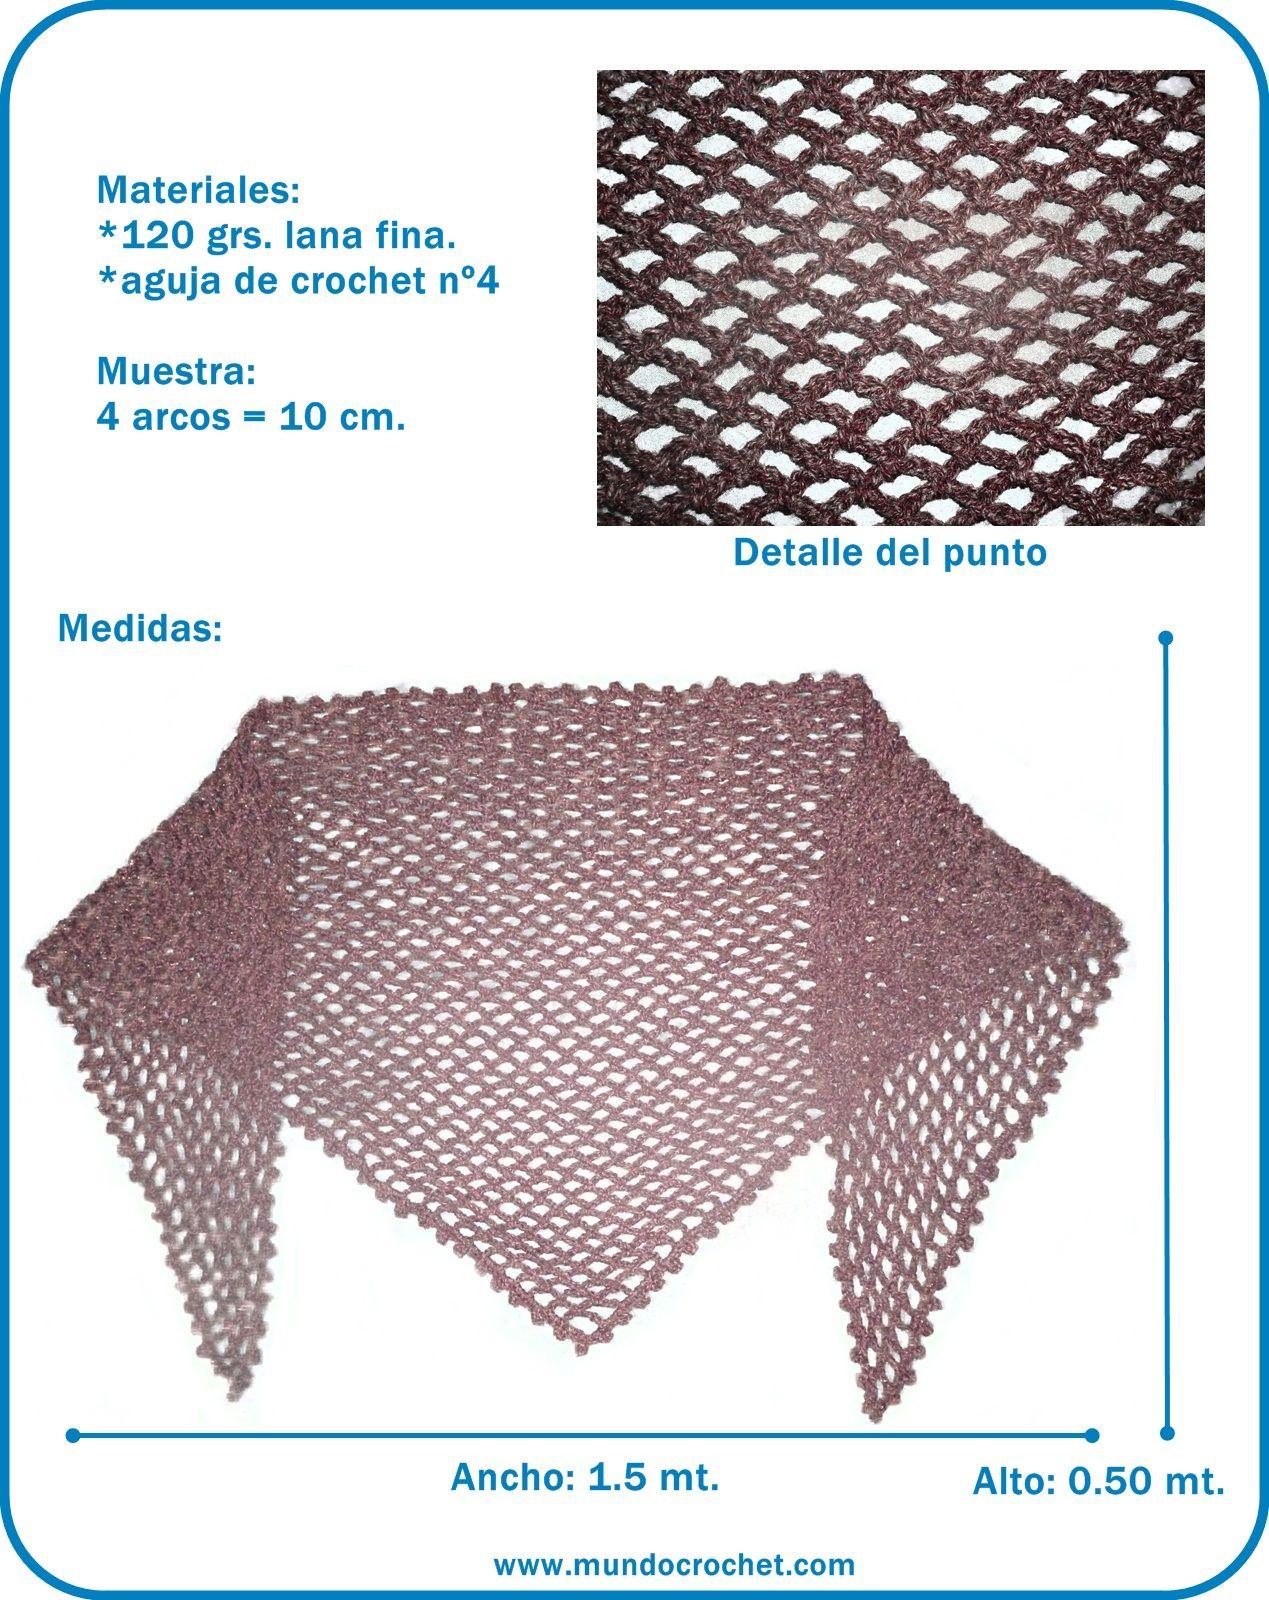 Chal triangular en punto red - Triangular crochet scarf - Mundo ...